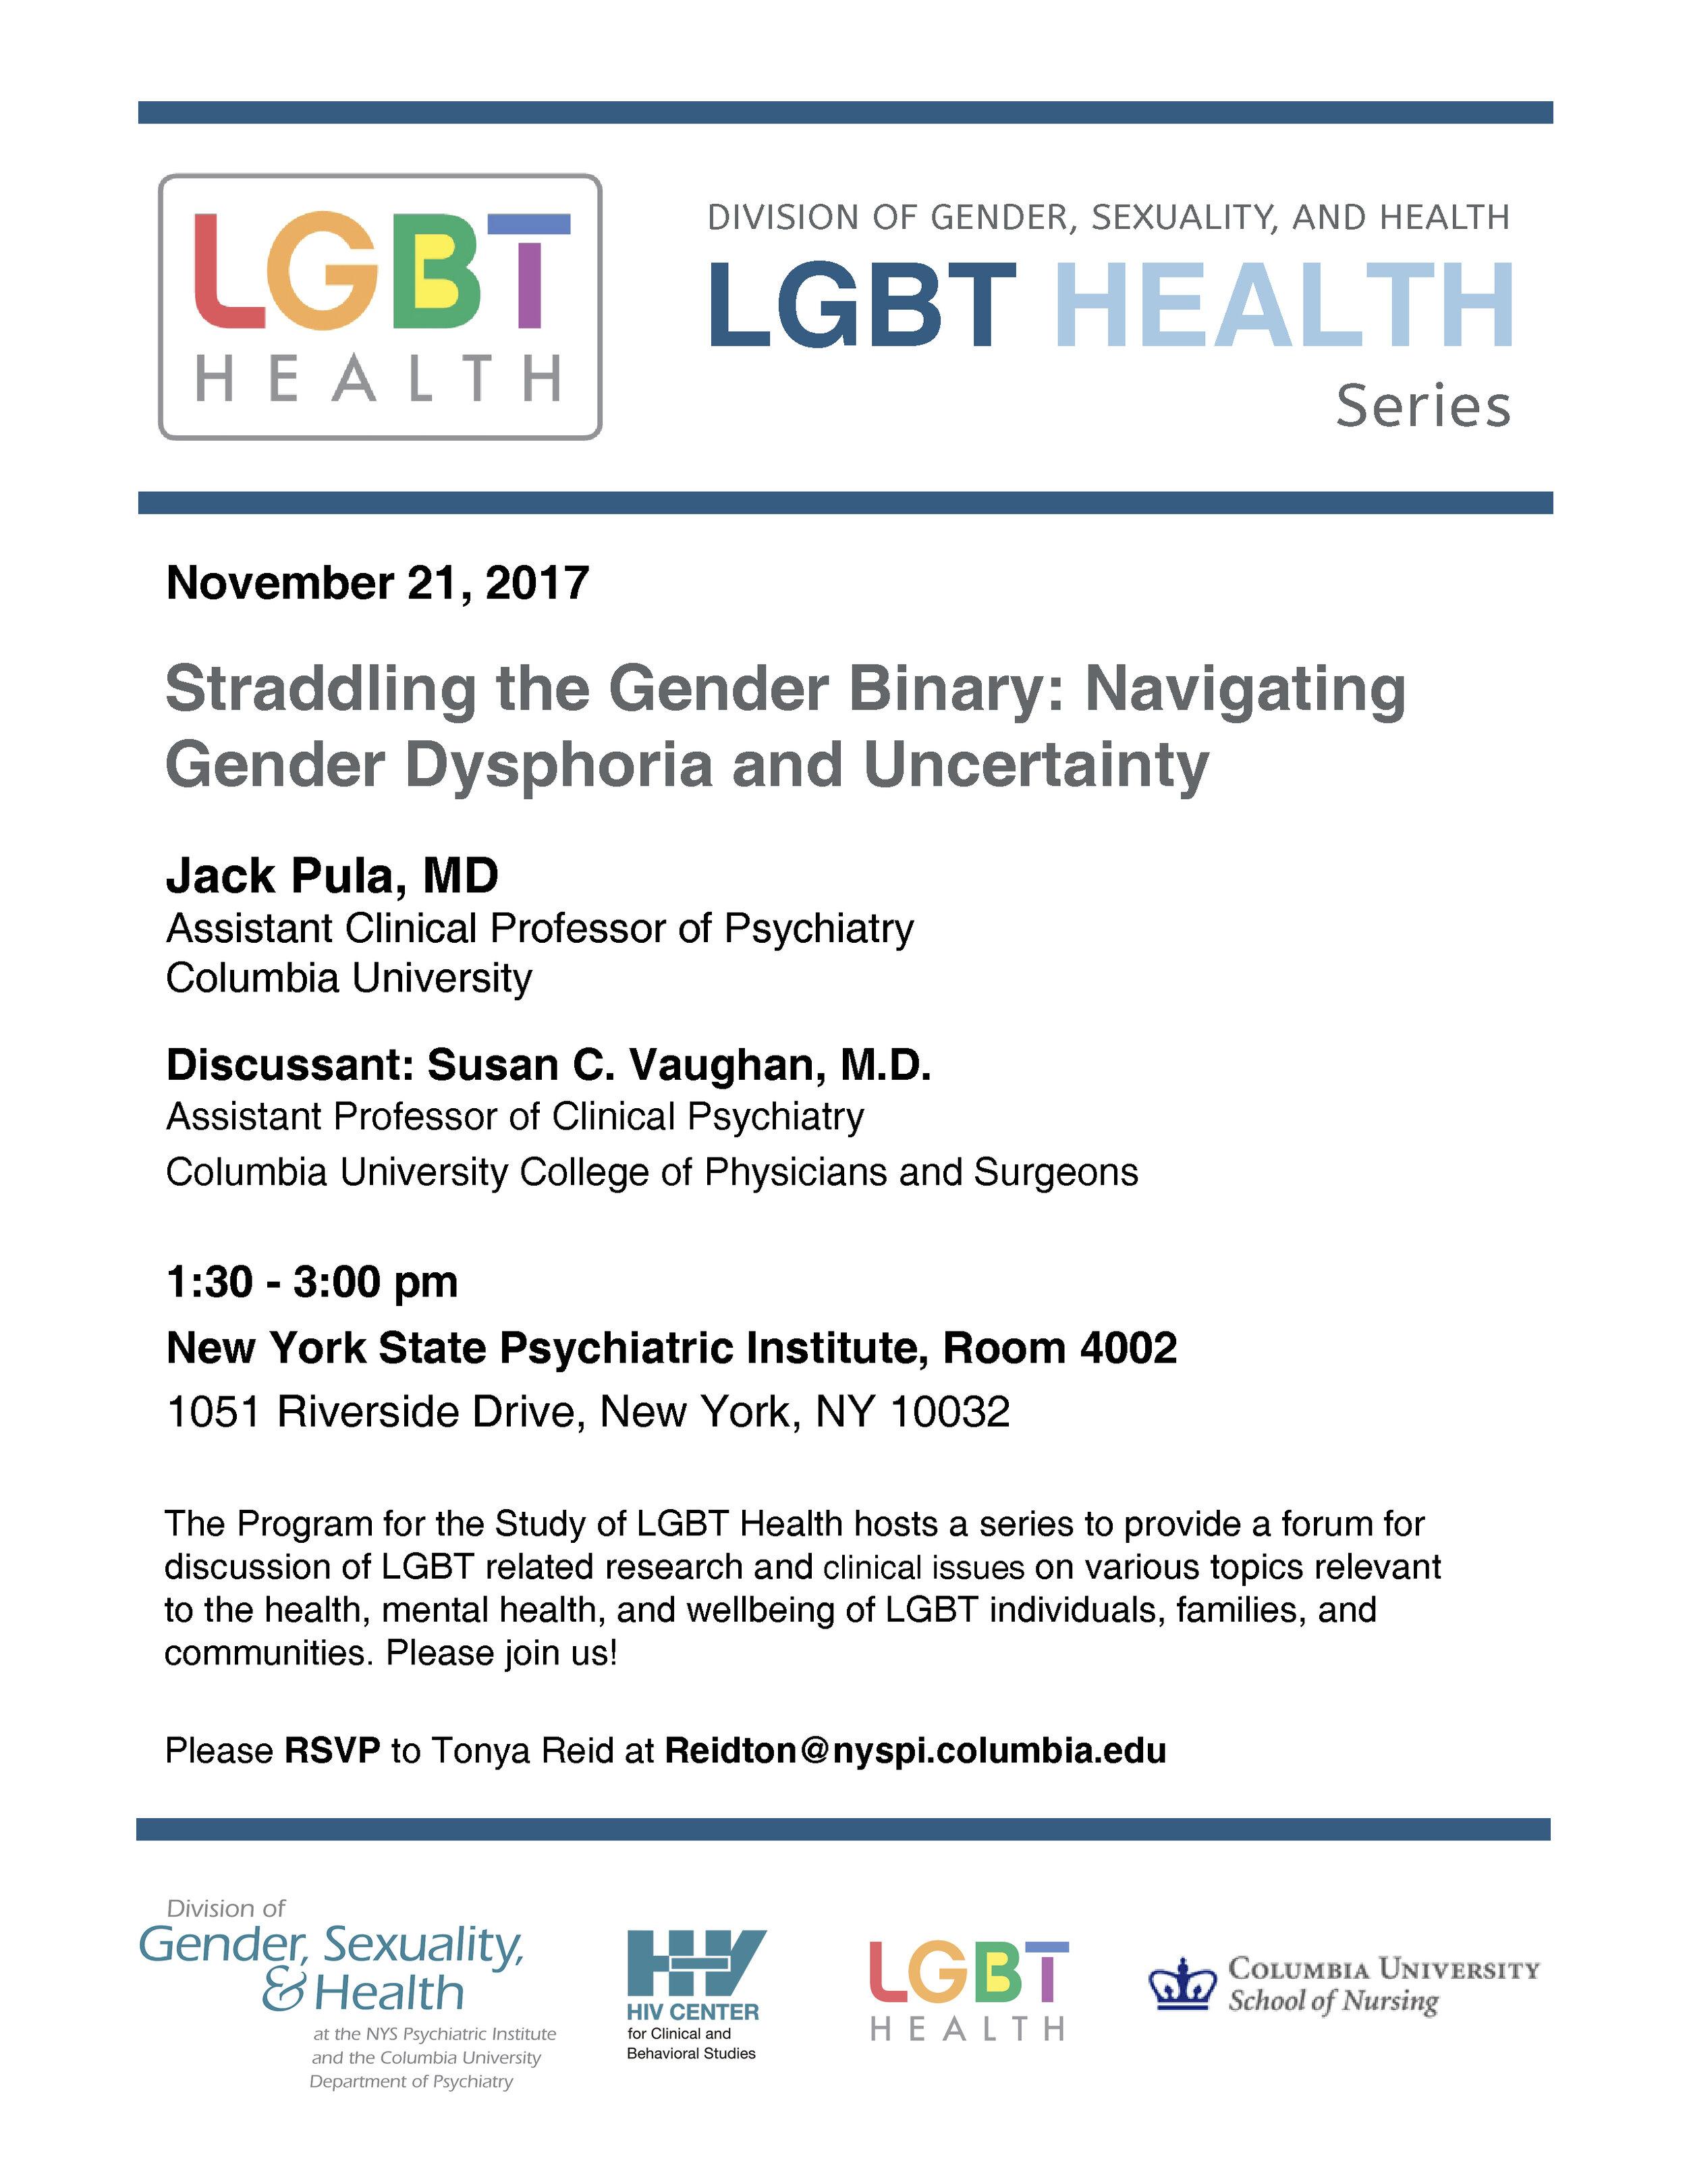 LGBT Health Series Nov 21 2017.jpg